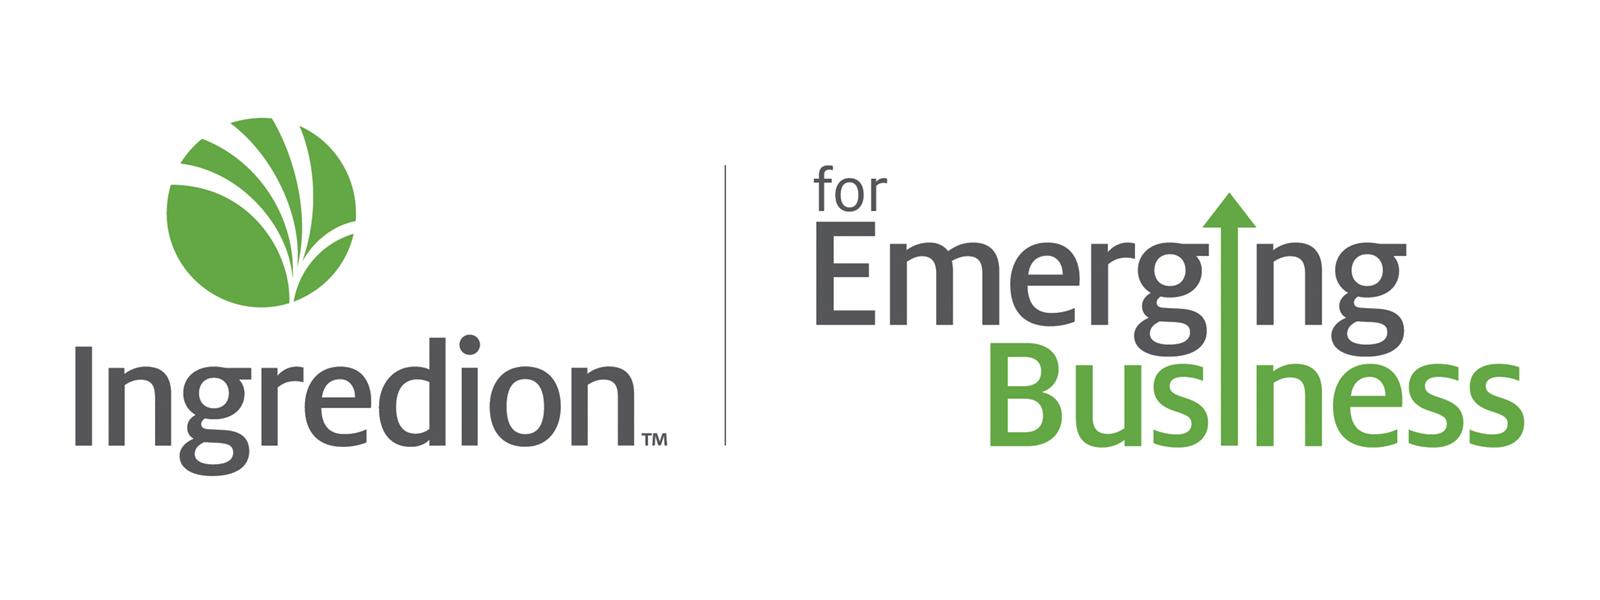 ingredion-for-emerging-business